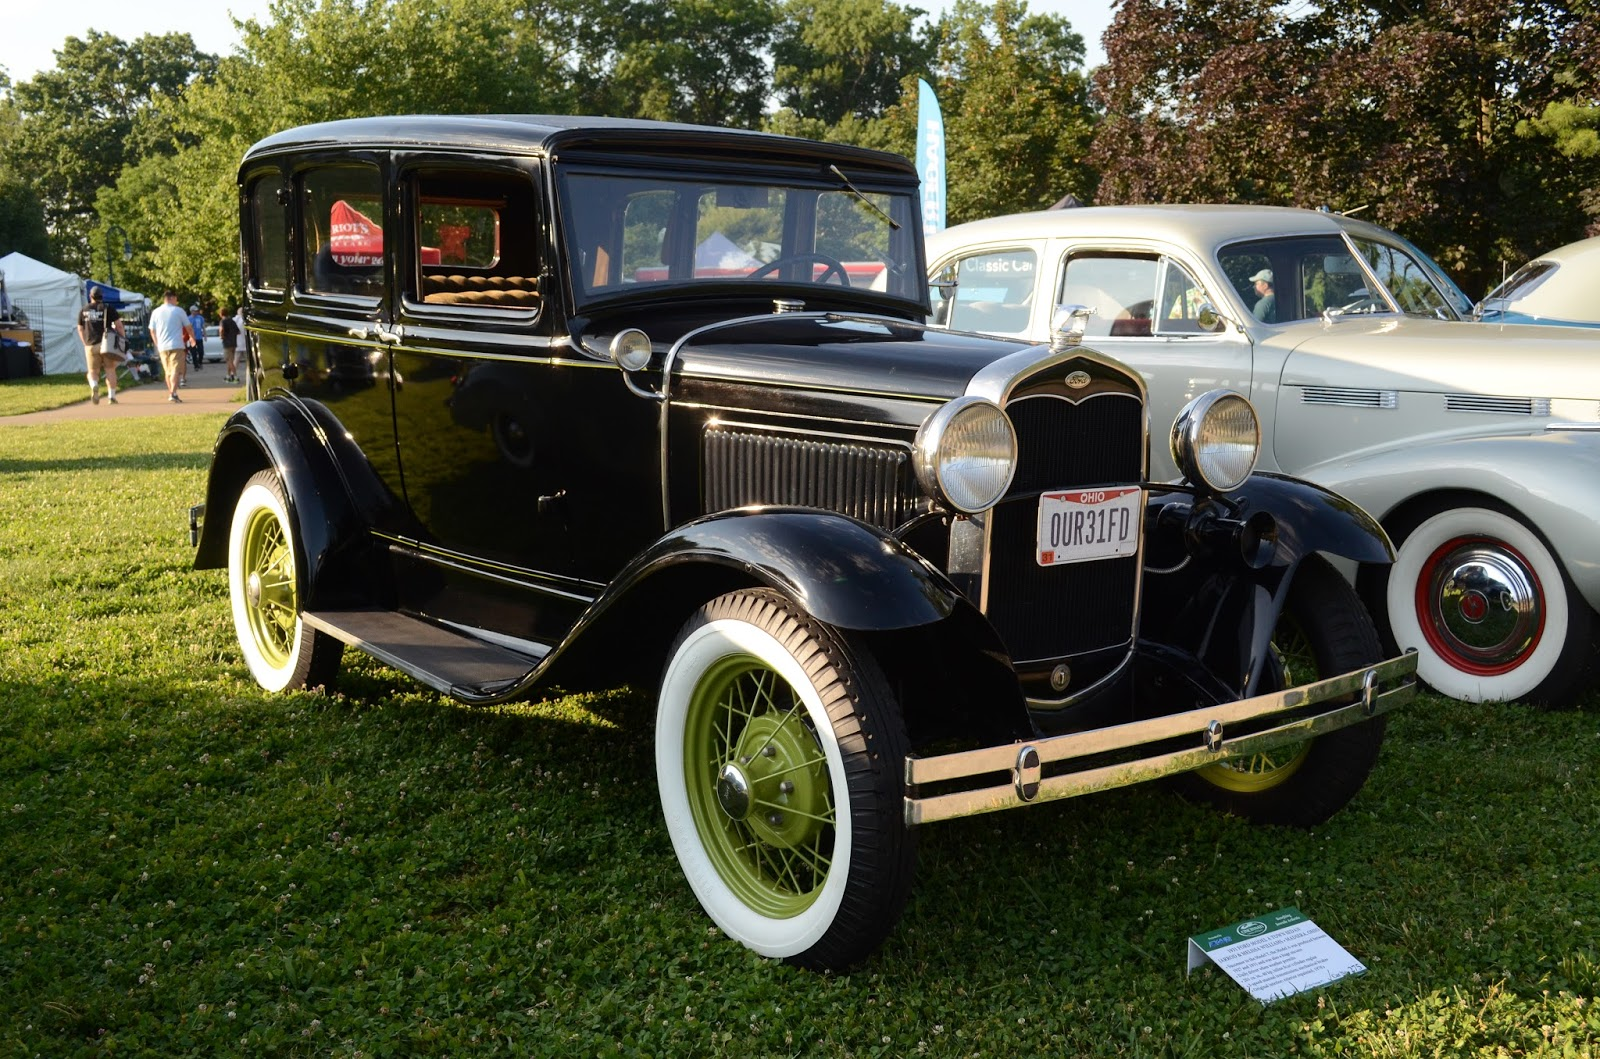 Turnerbudds Car Blog: Pre-War Vintage At the Concours